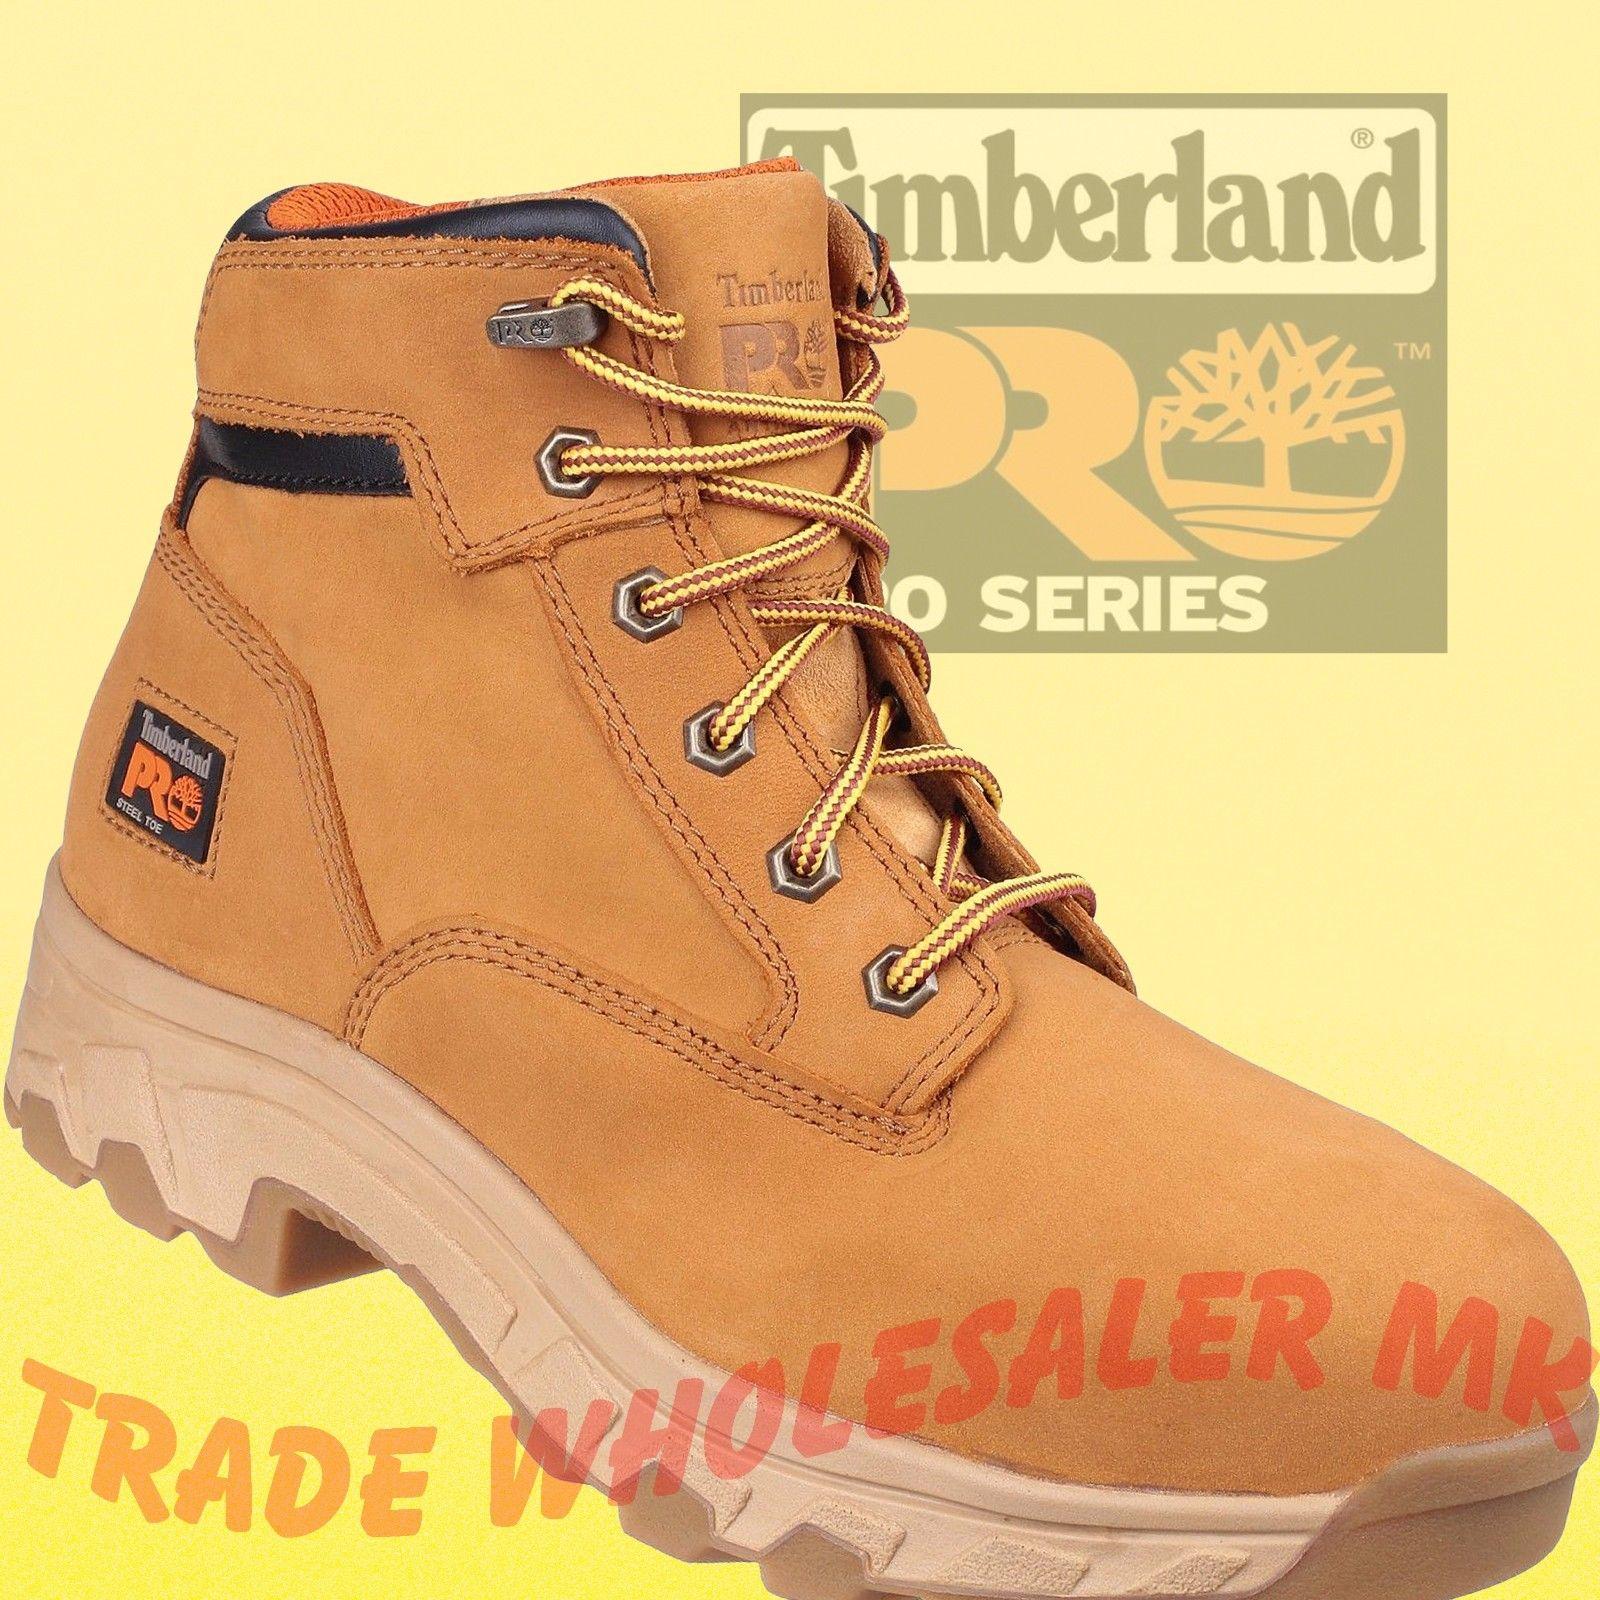 46c99eb88c9 Timberland Pro Safety Boots Hiker Honey Workstead Wheat UK 6-12